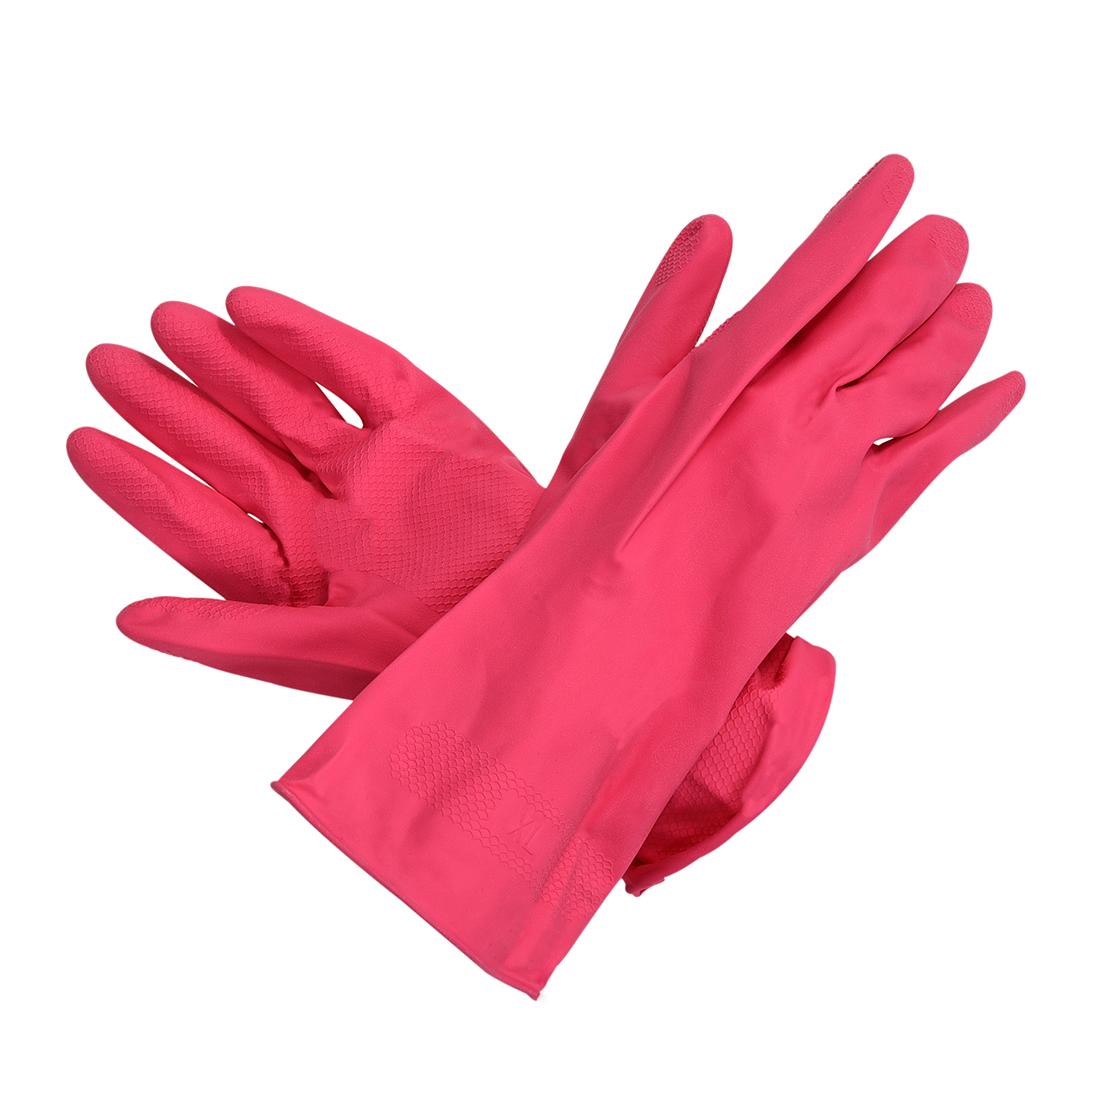 Antislip Clean Wash Latex Gloves 2 PCS Pink X2O6